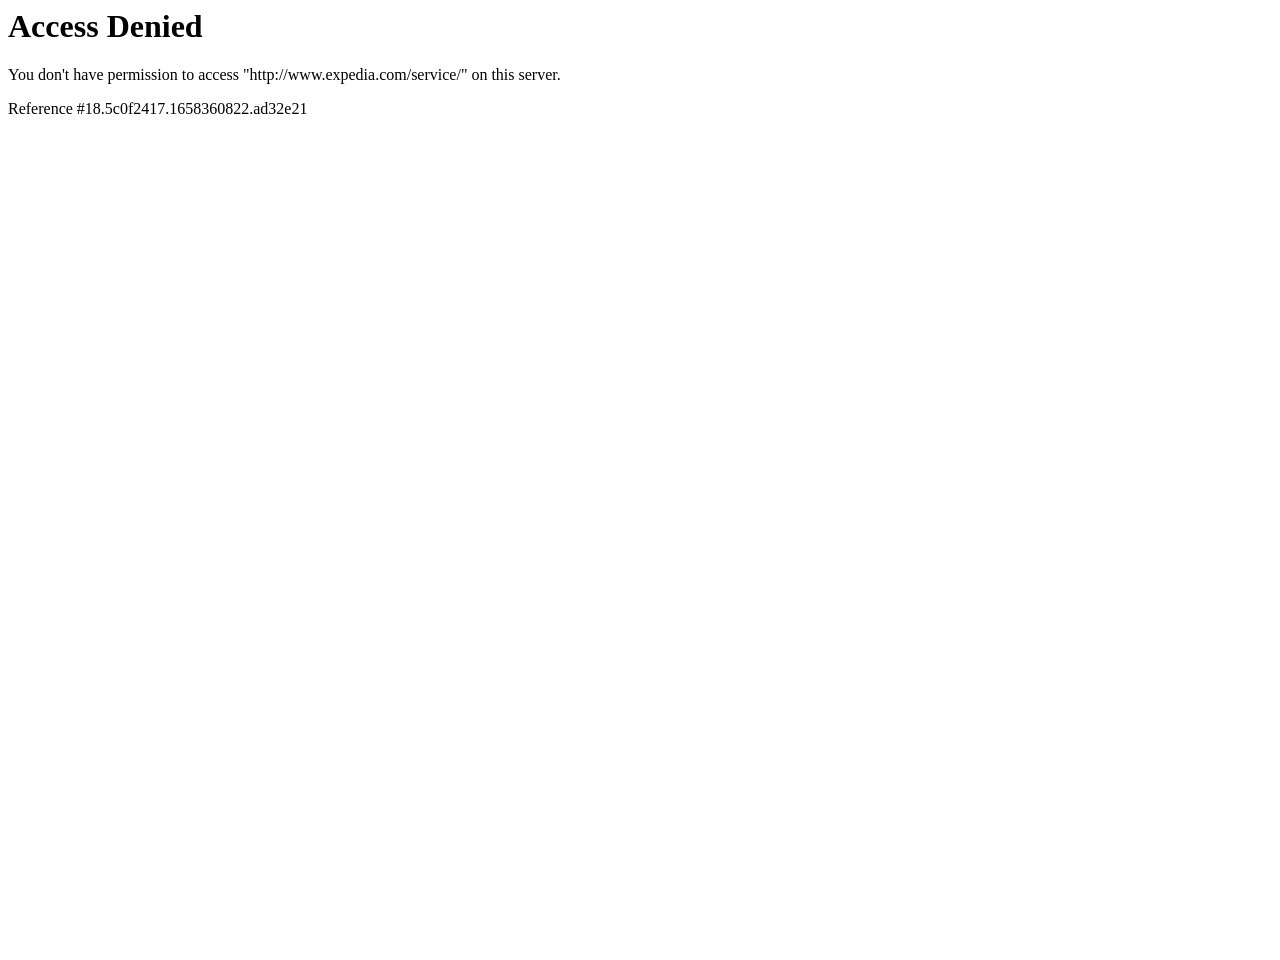 Customer Service Portal - Expedia